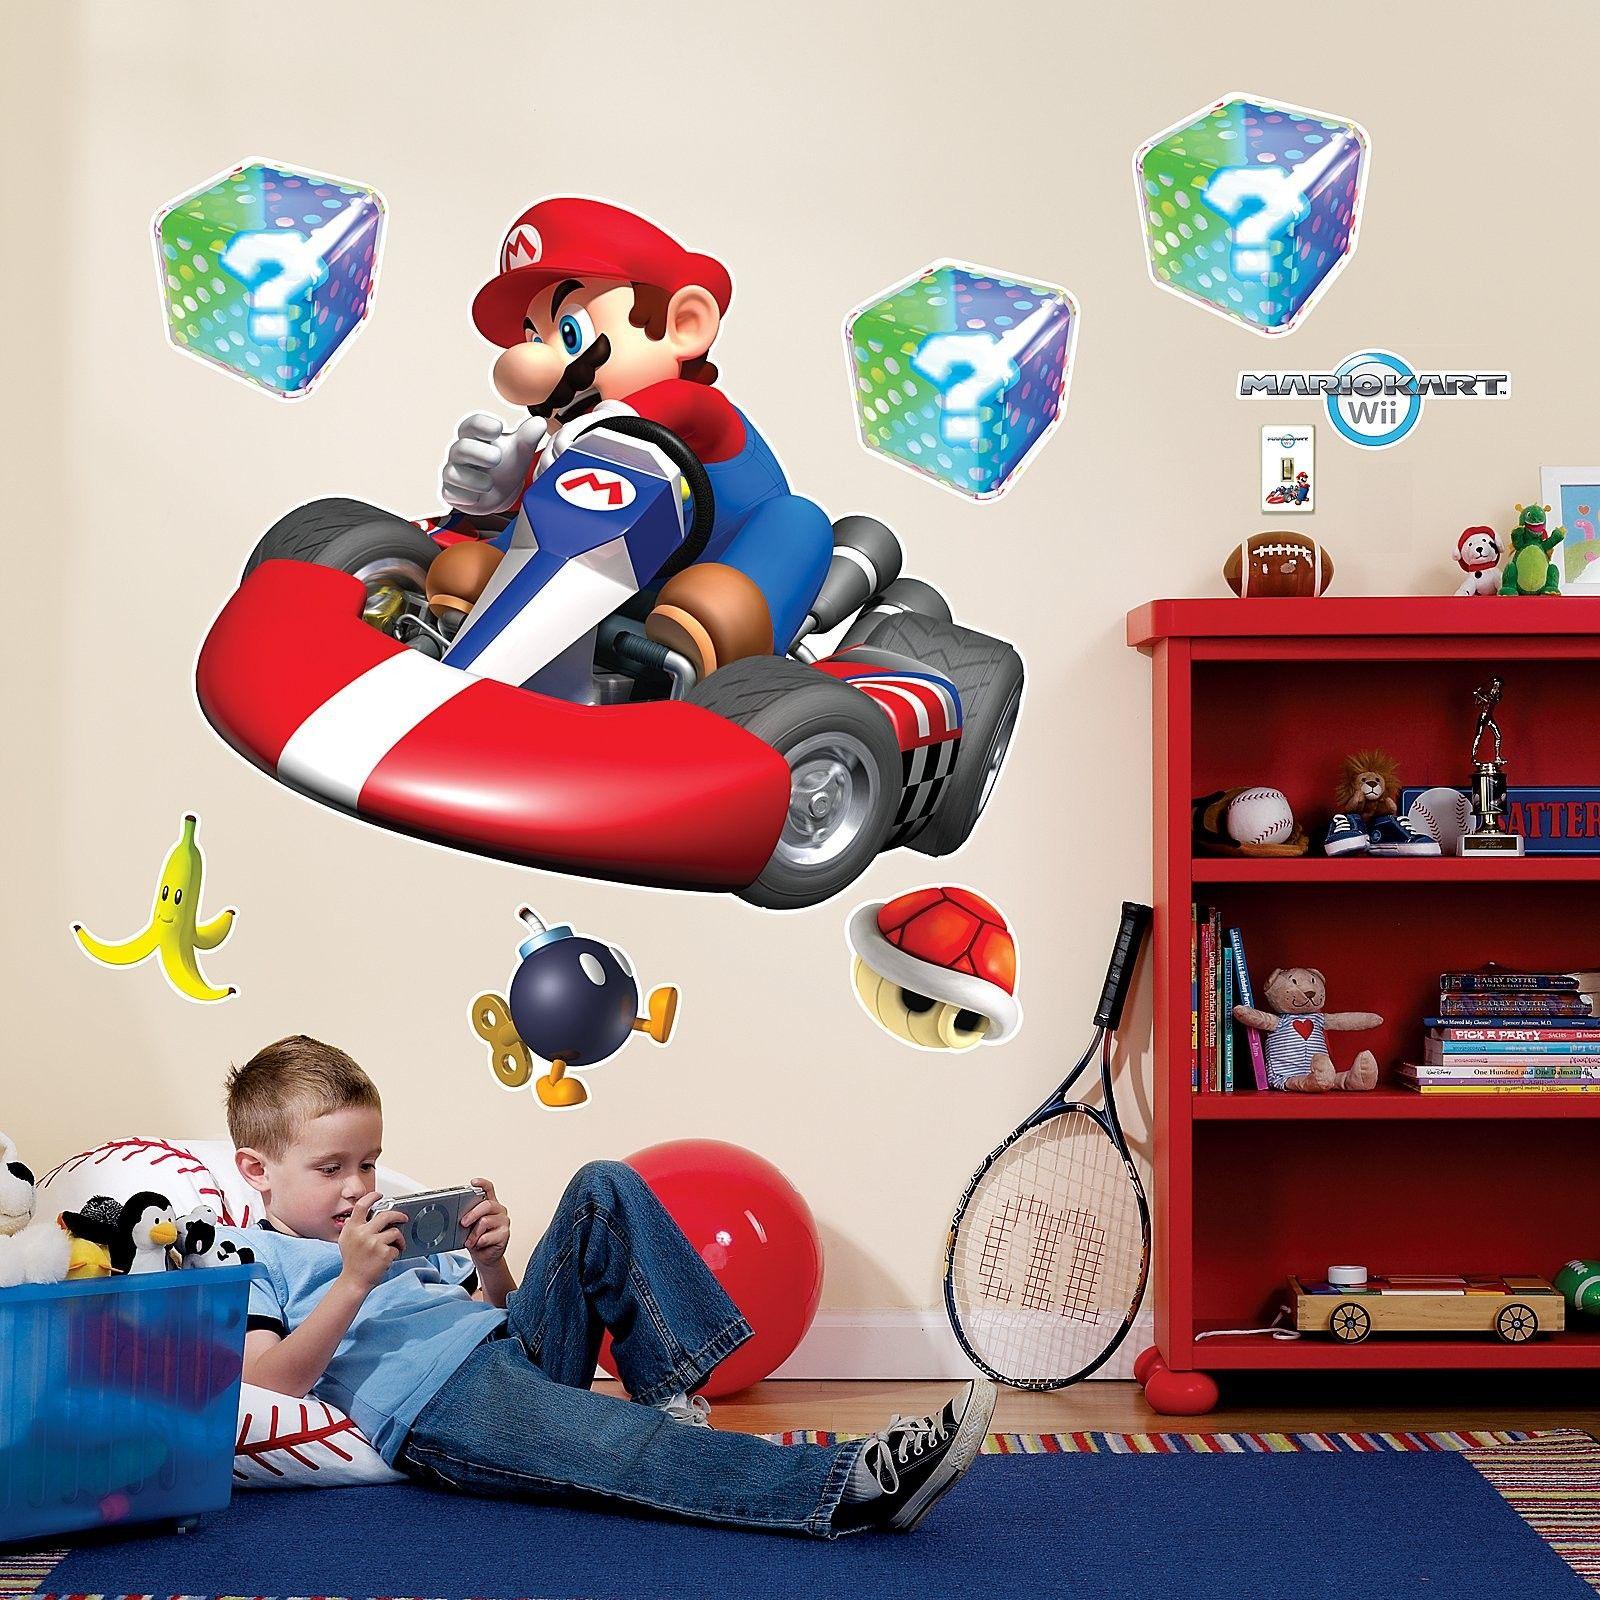 Mario Kart Wii Giant Wall Decals Mario Kart Mario Room Wall Decals